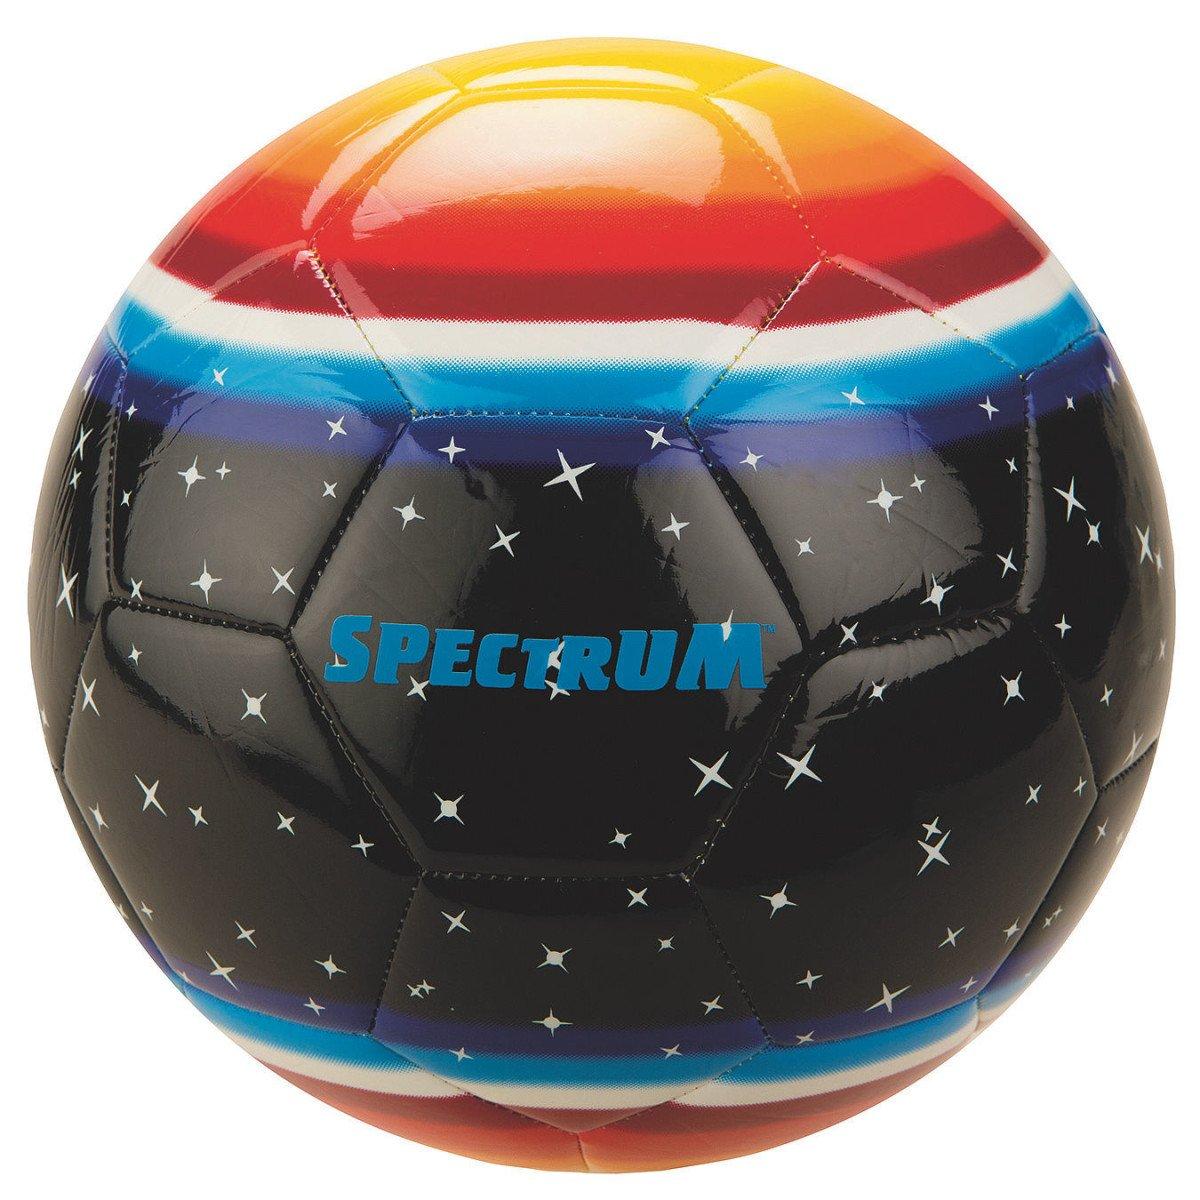 Spectrum Galaxy Soccer Balls B00SL3VR8MSIZE 3